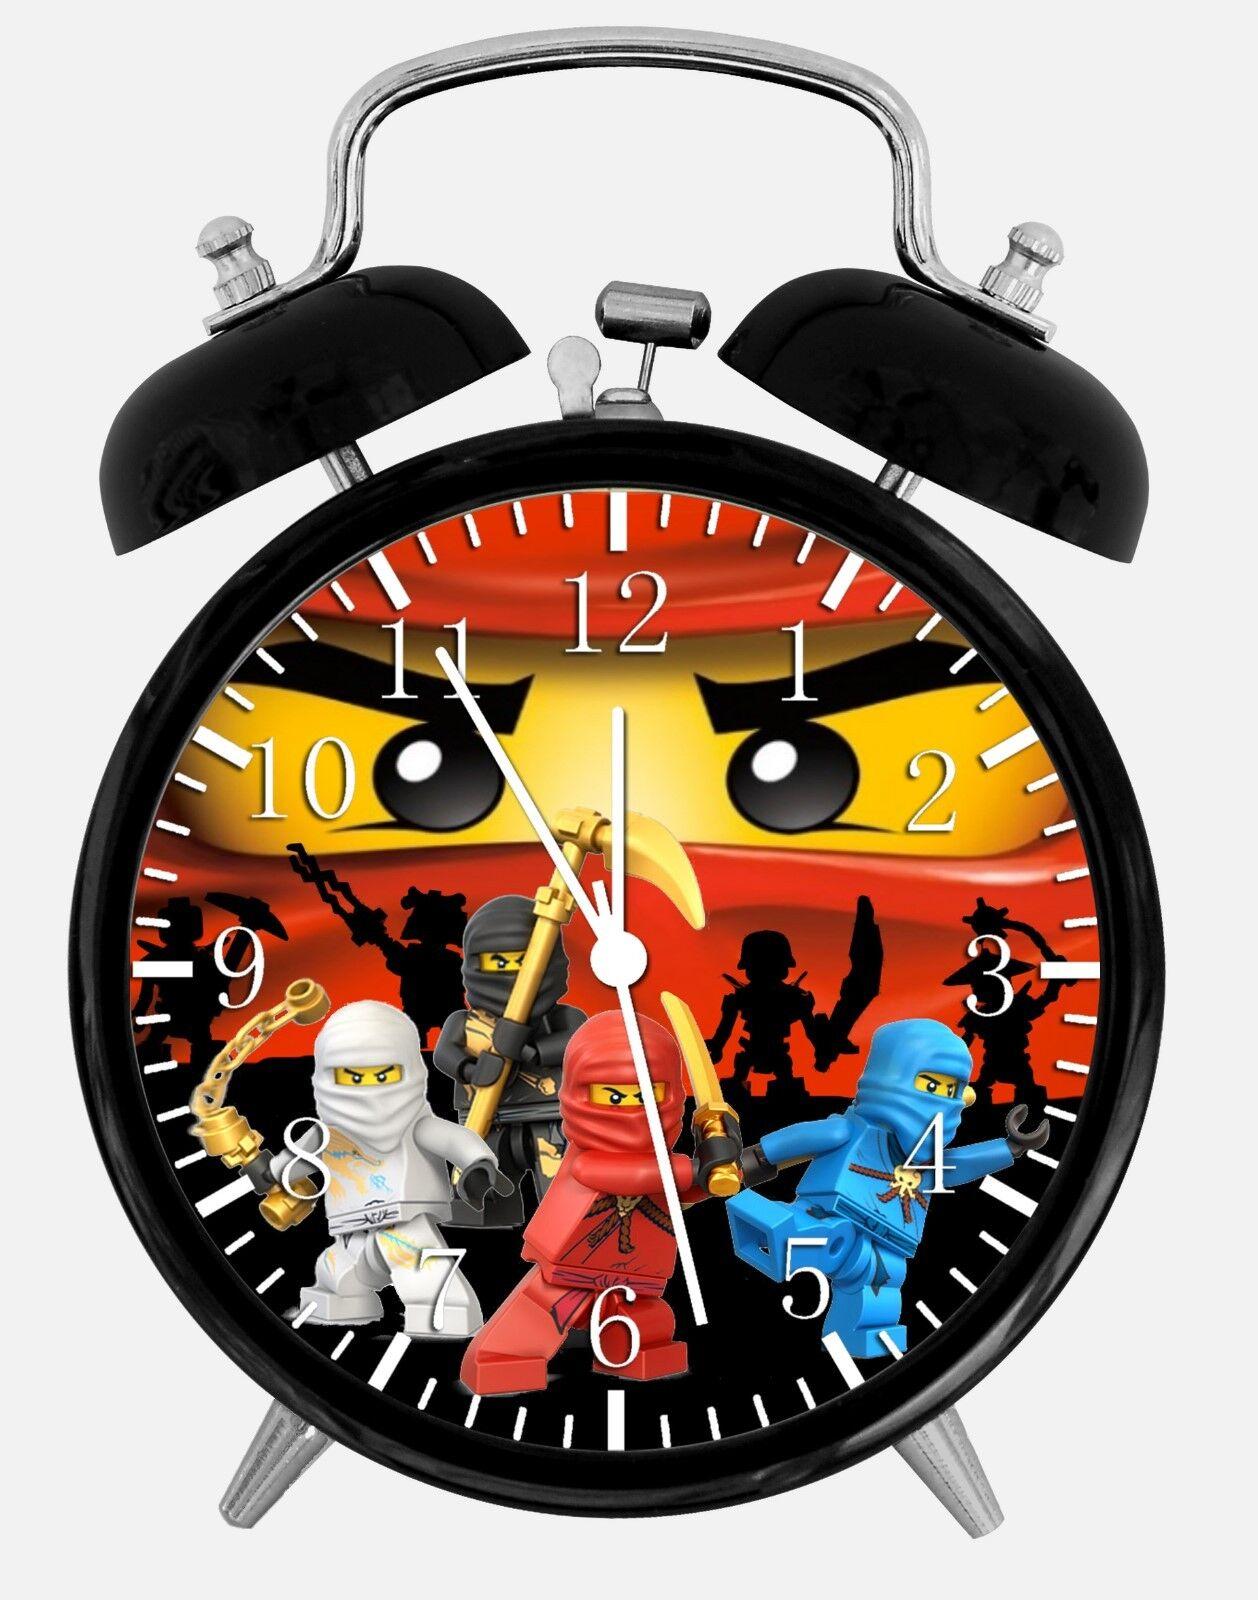 "Lego Ninjago Alarm Desk Clock 3.75"" Home or Office Decor W459 Nice For Gift"